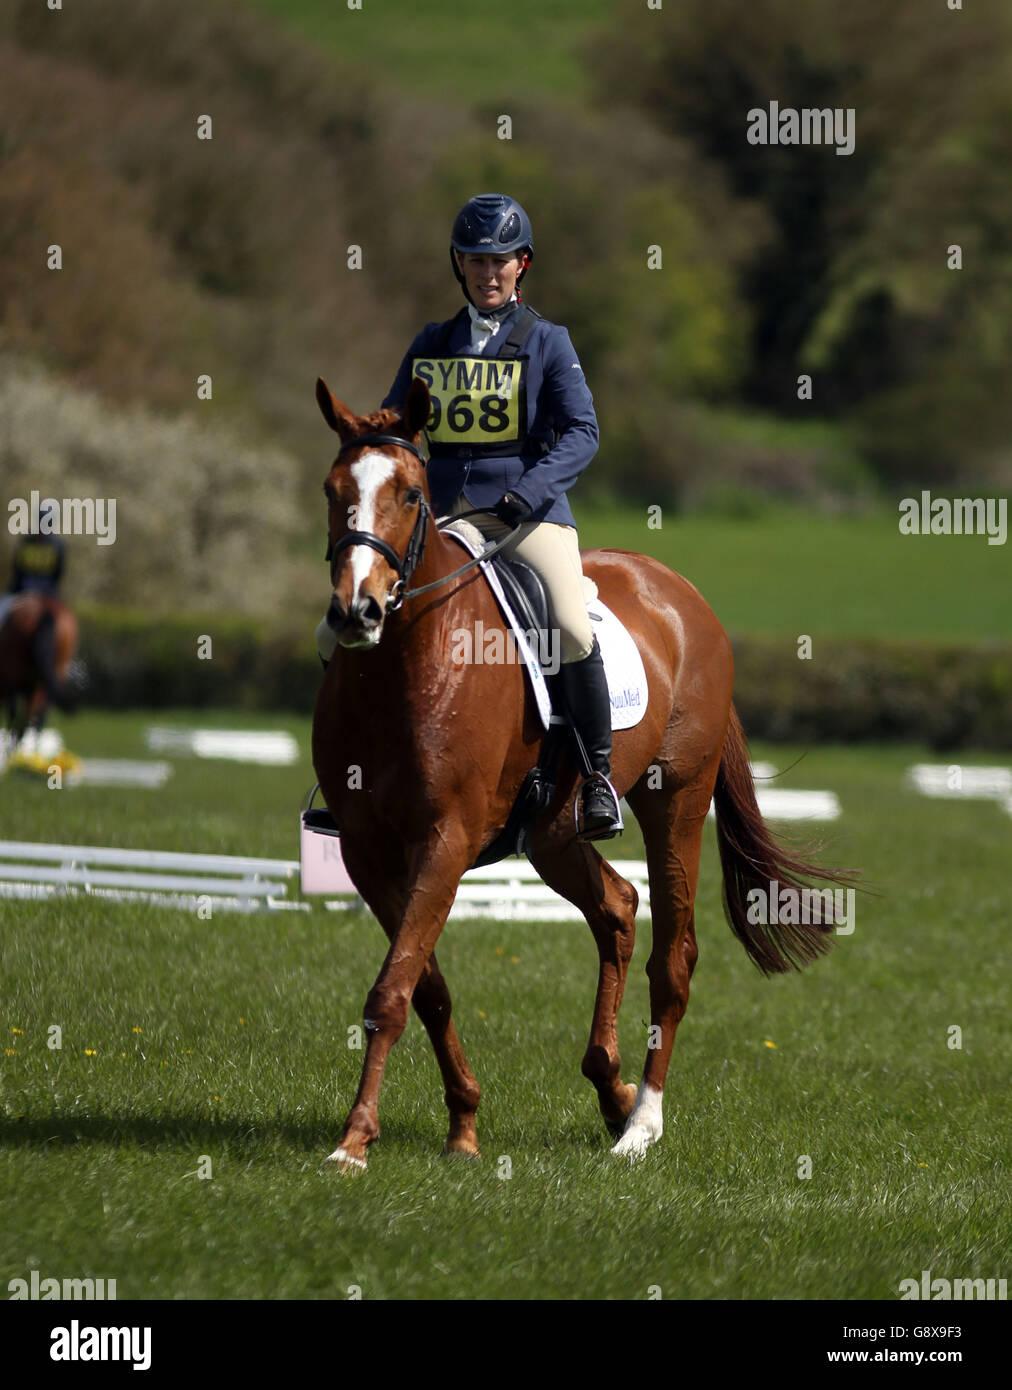 2016 Symm International Horse Trials - Day Three - Hambleden - Stock Image